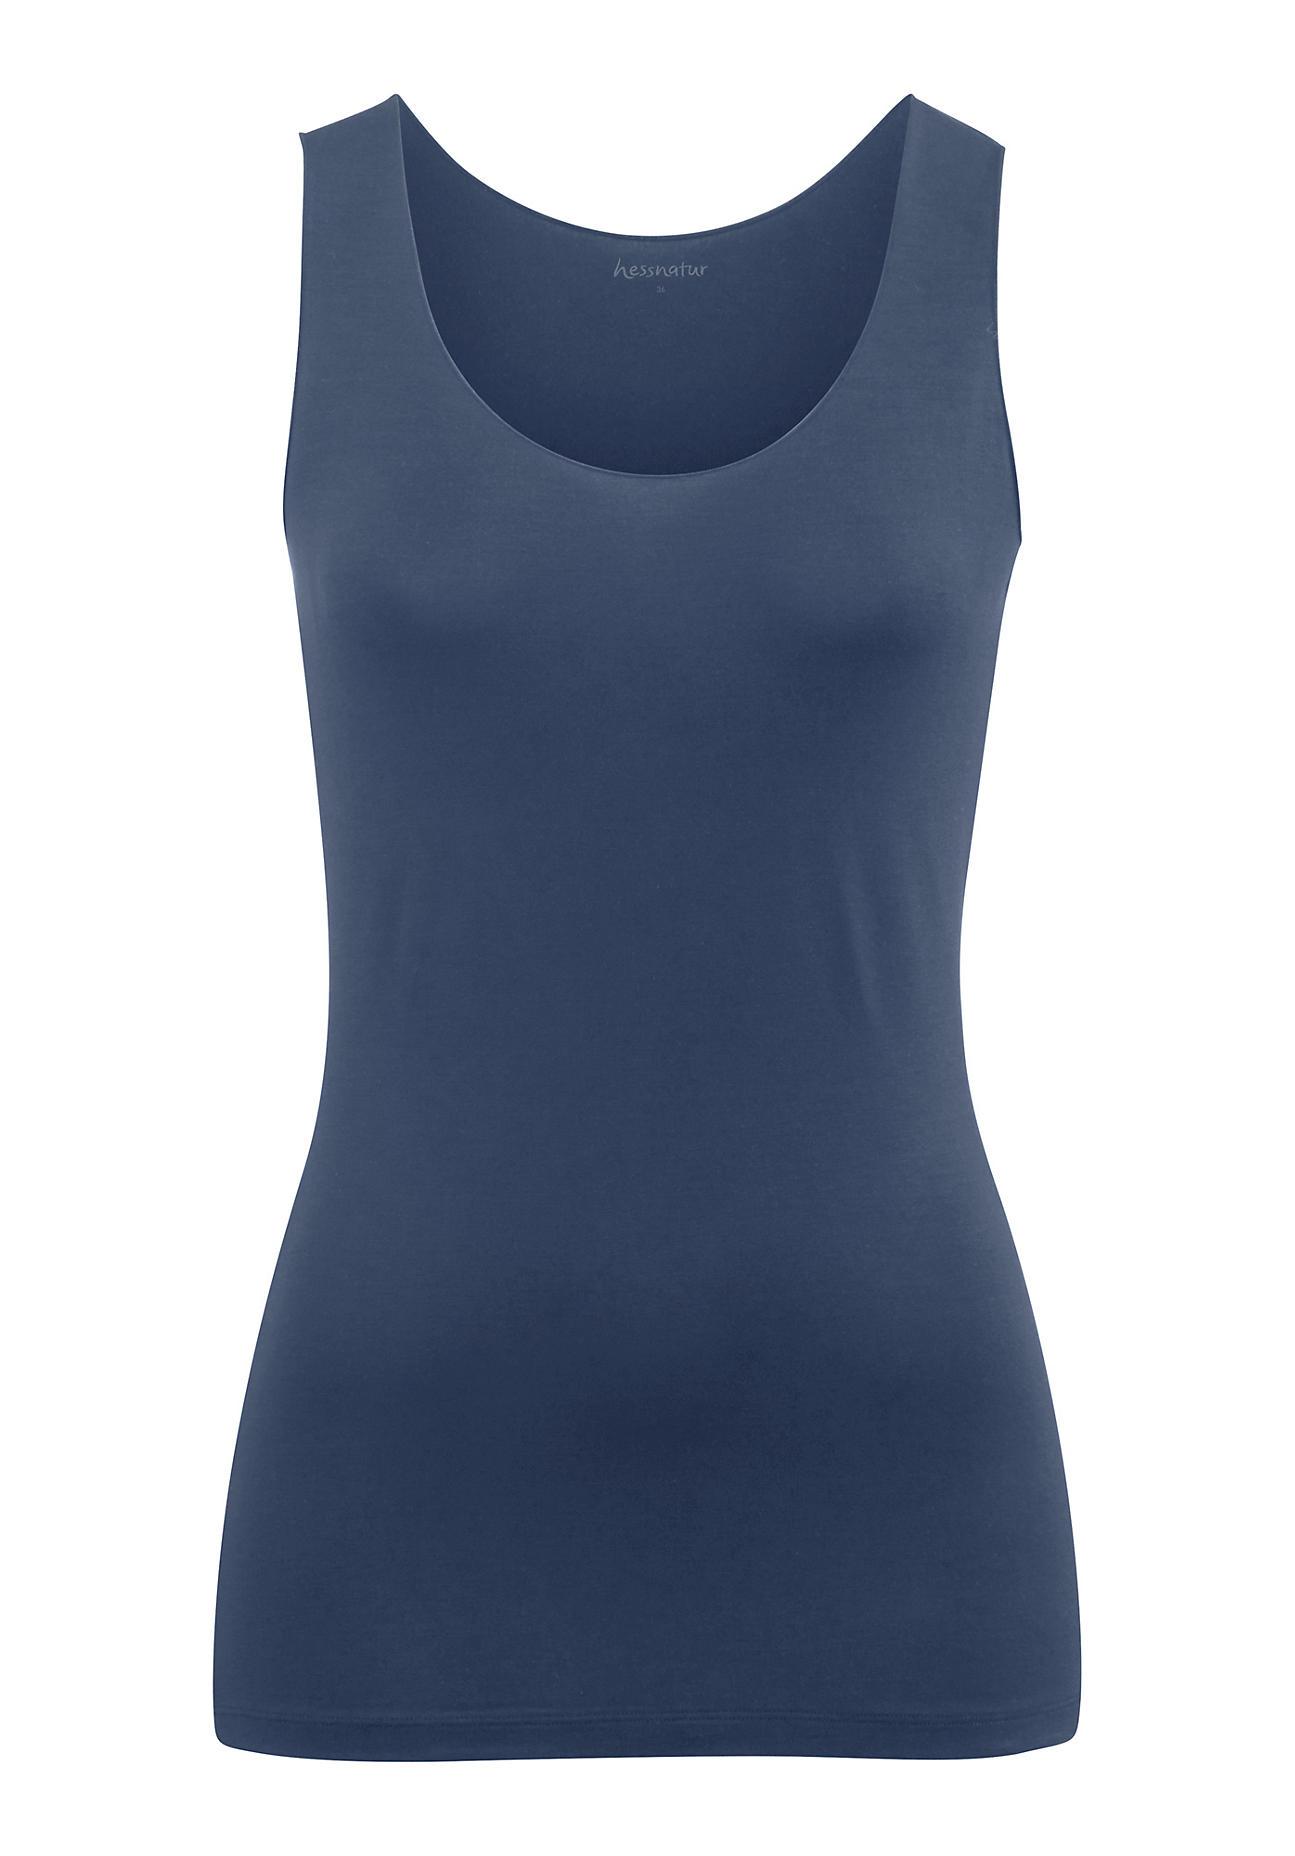 hessnatur Damen Top aus Modal – blau – Größe 38